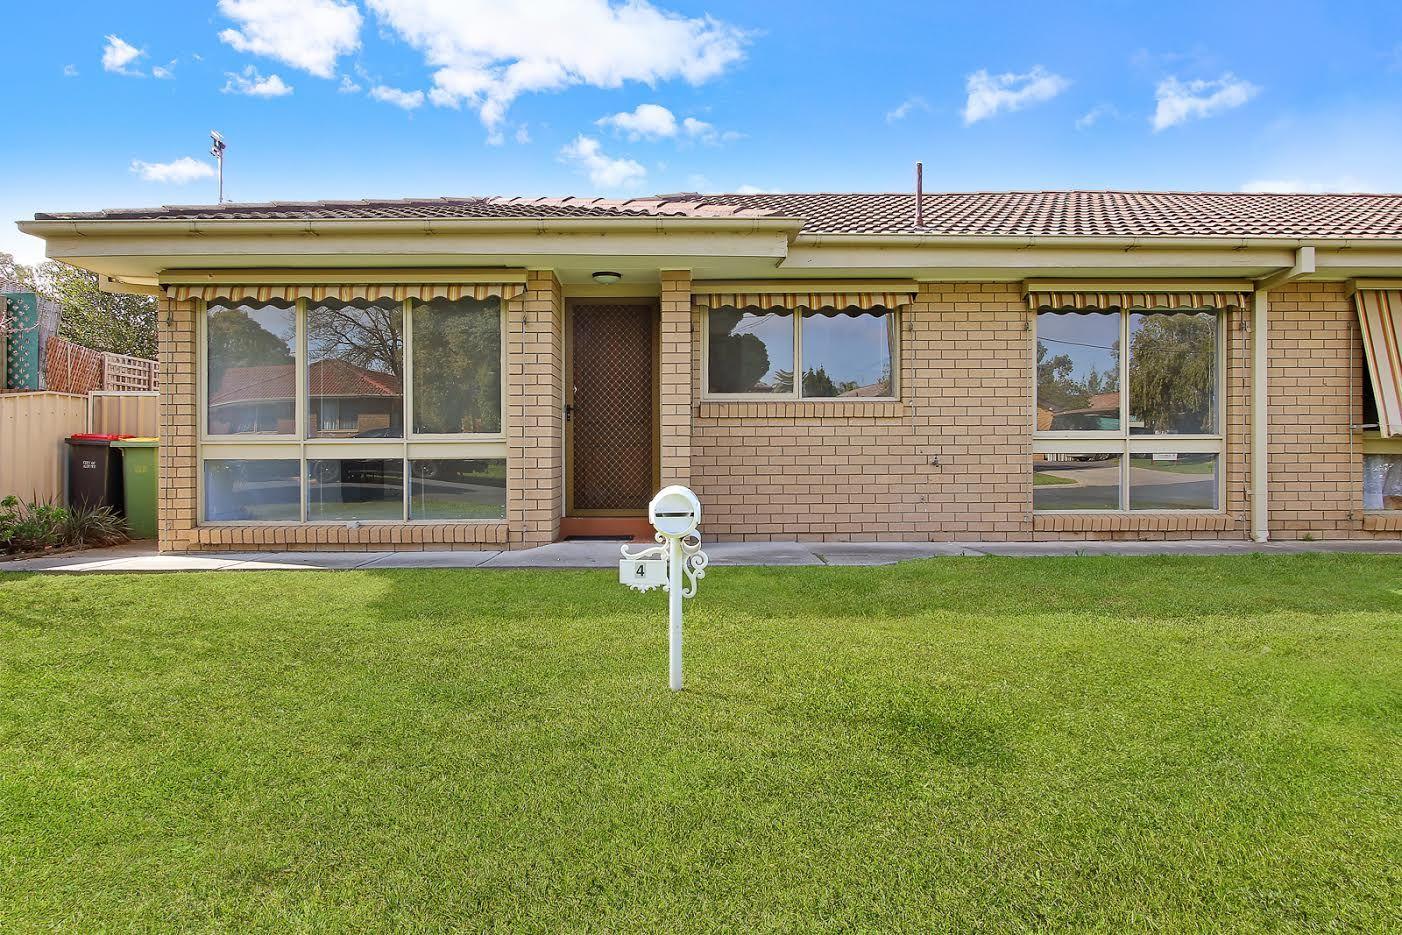 4/148 Alexandra Street, East Albury NSW 2640, Image 0